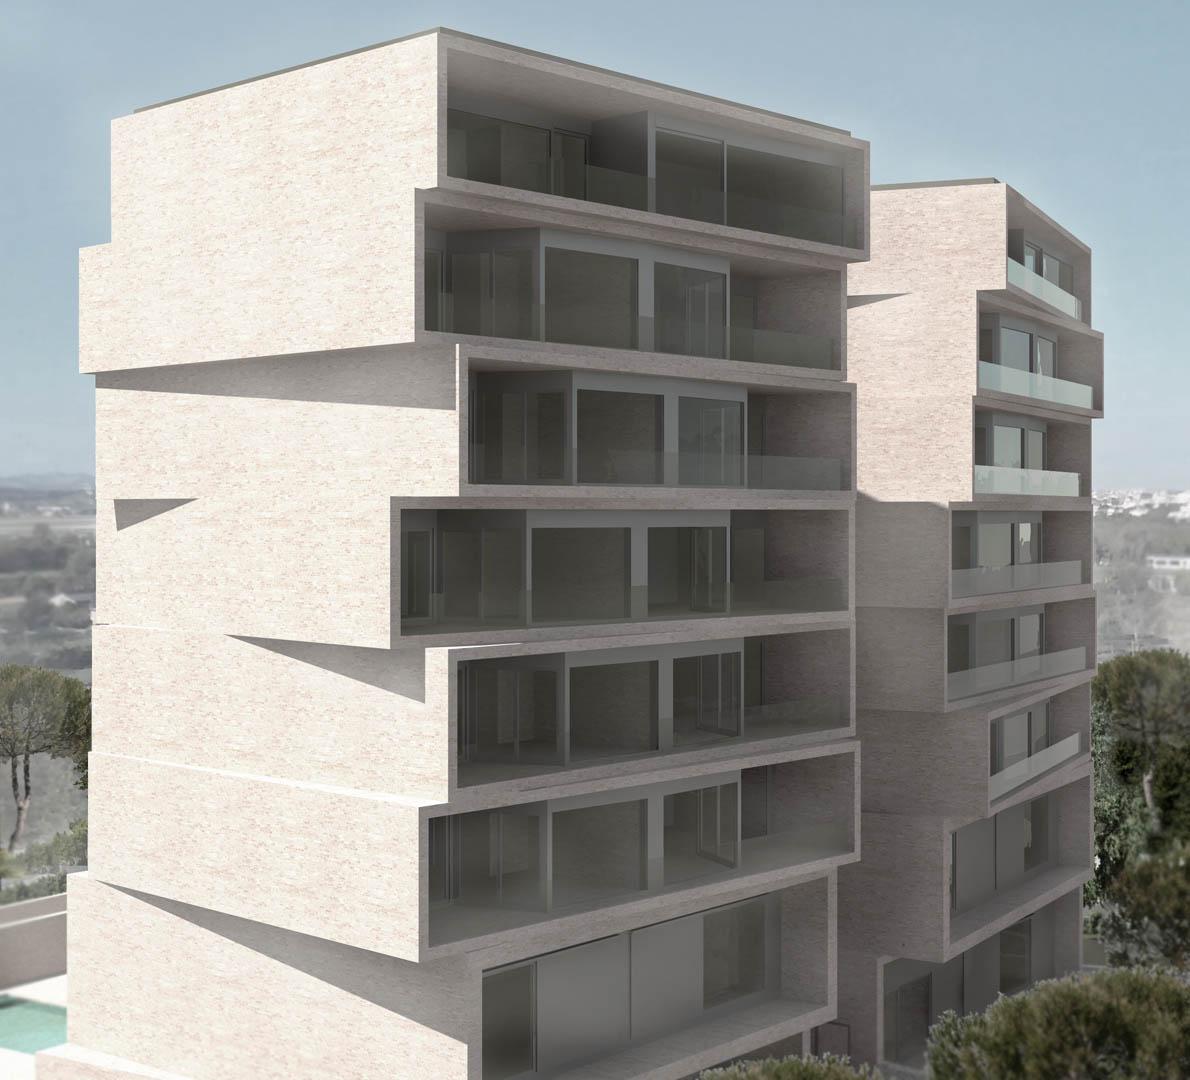 Studio Matteoni Colonia Umbra/Colonia Ferrovieri